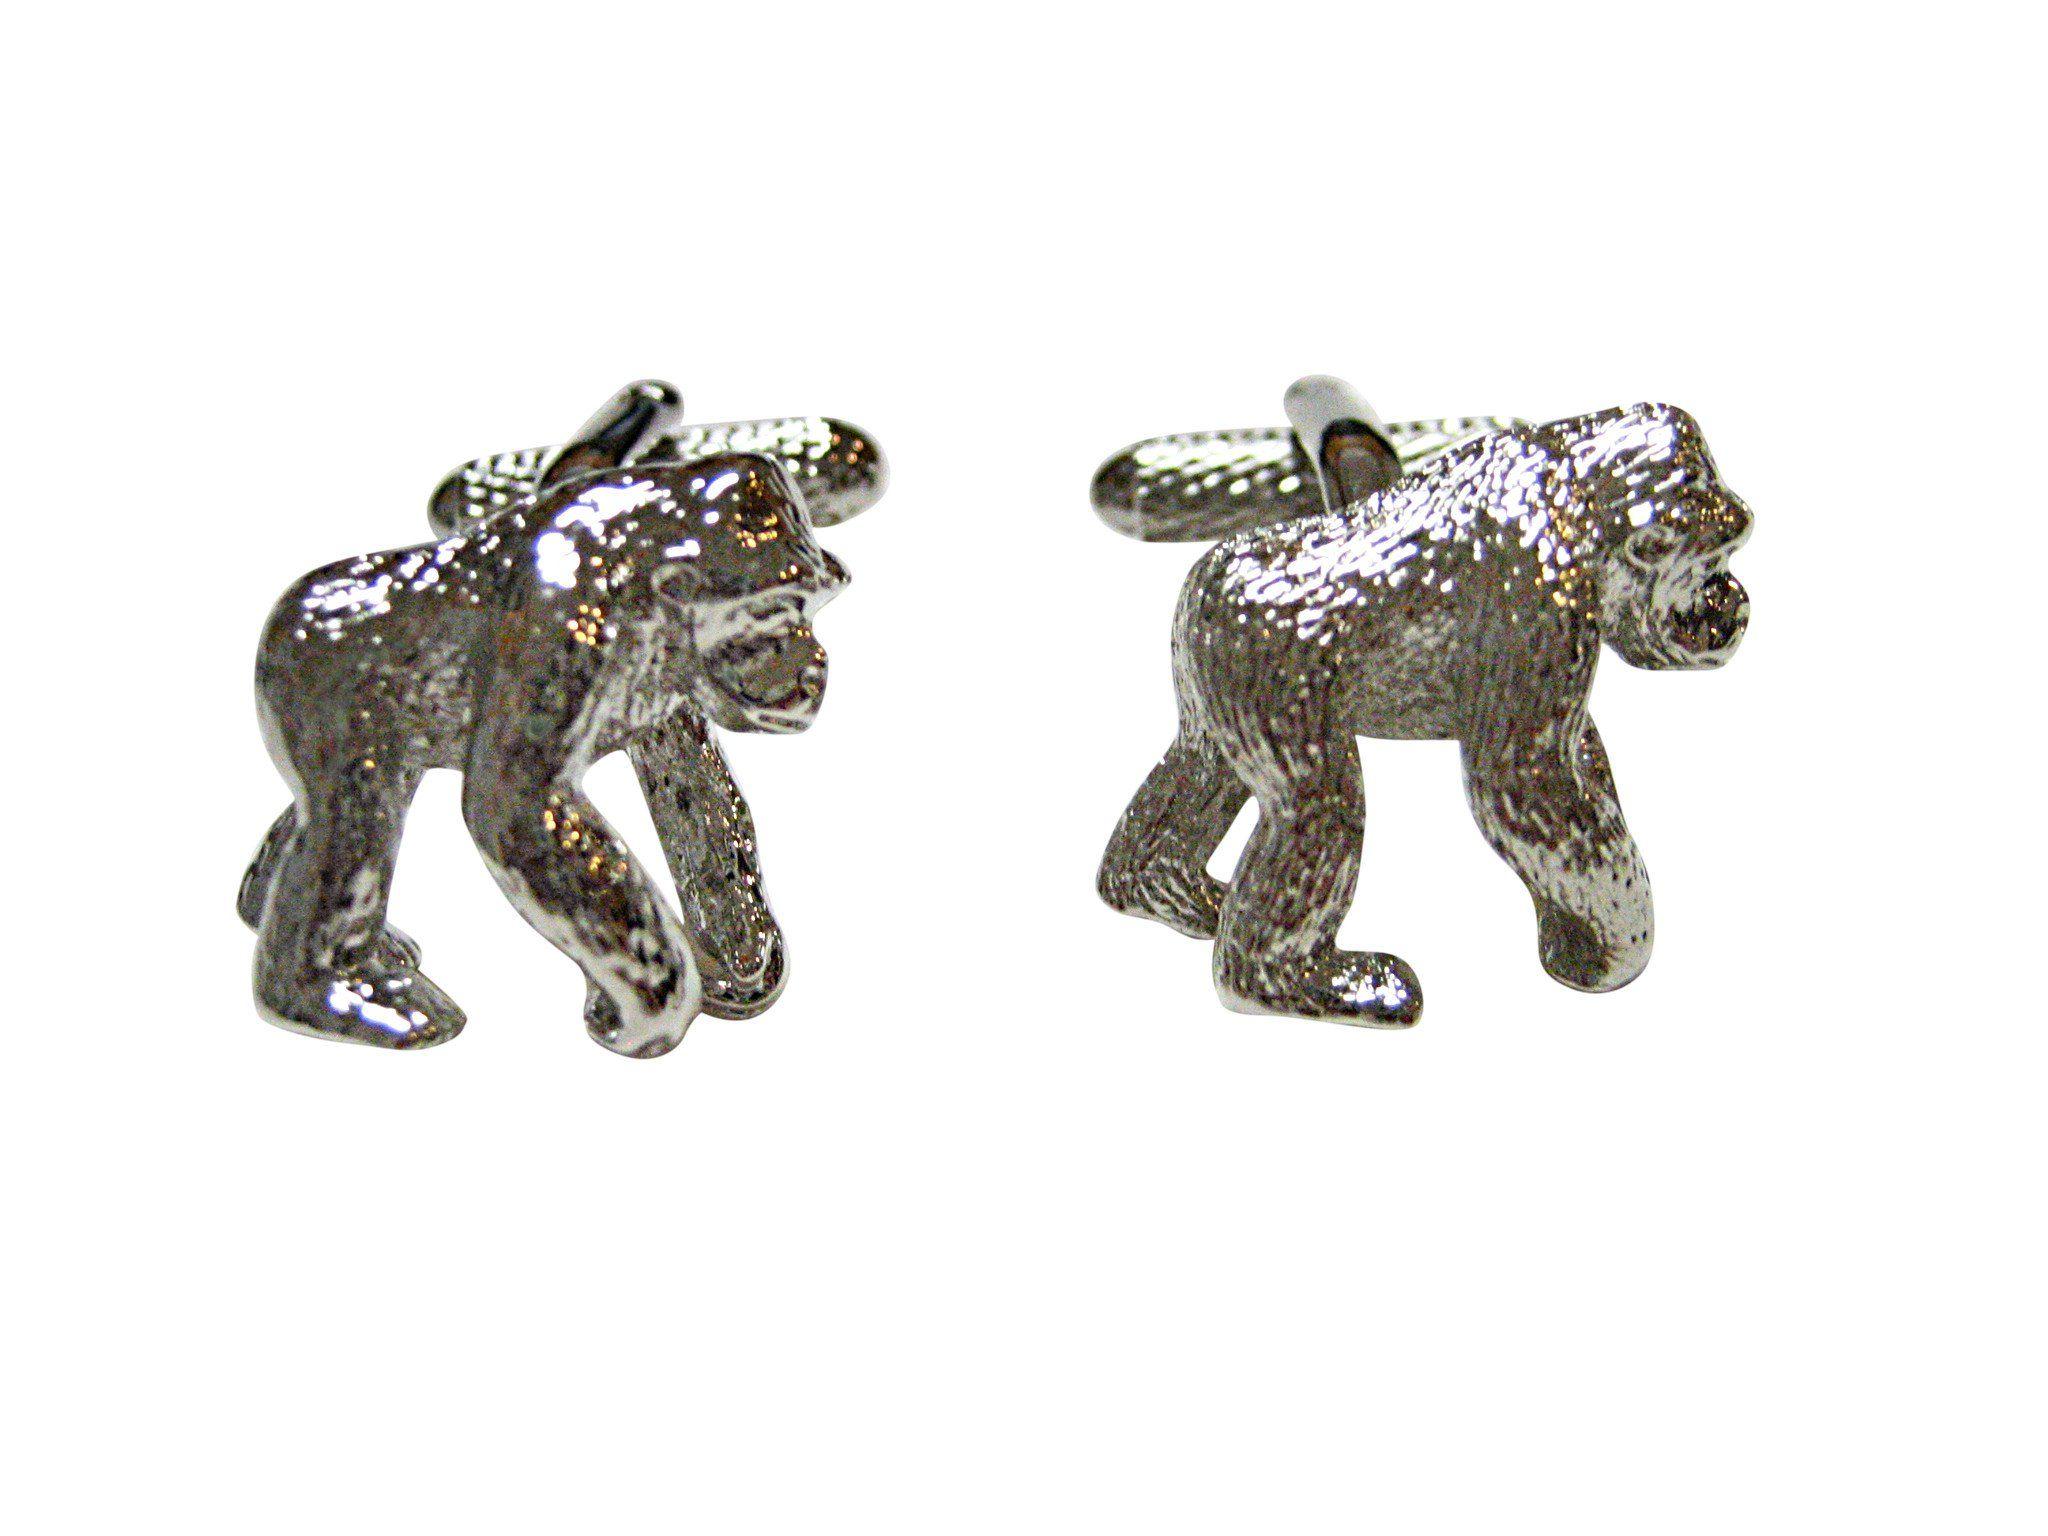 Silver Toned Gorilla Cufflinks